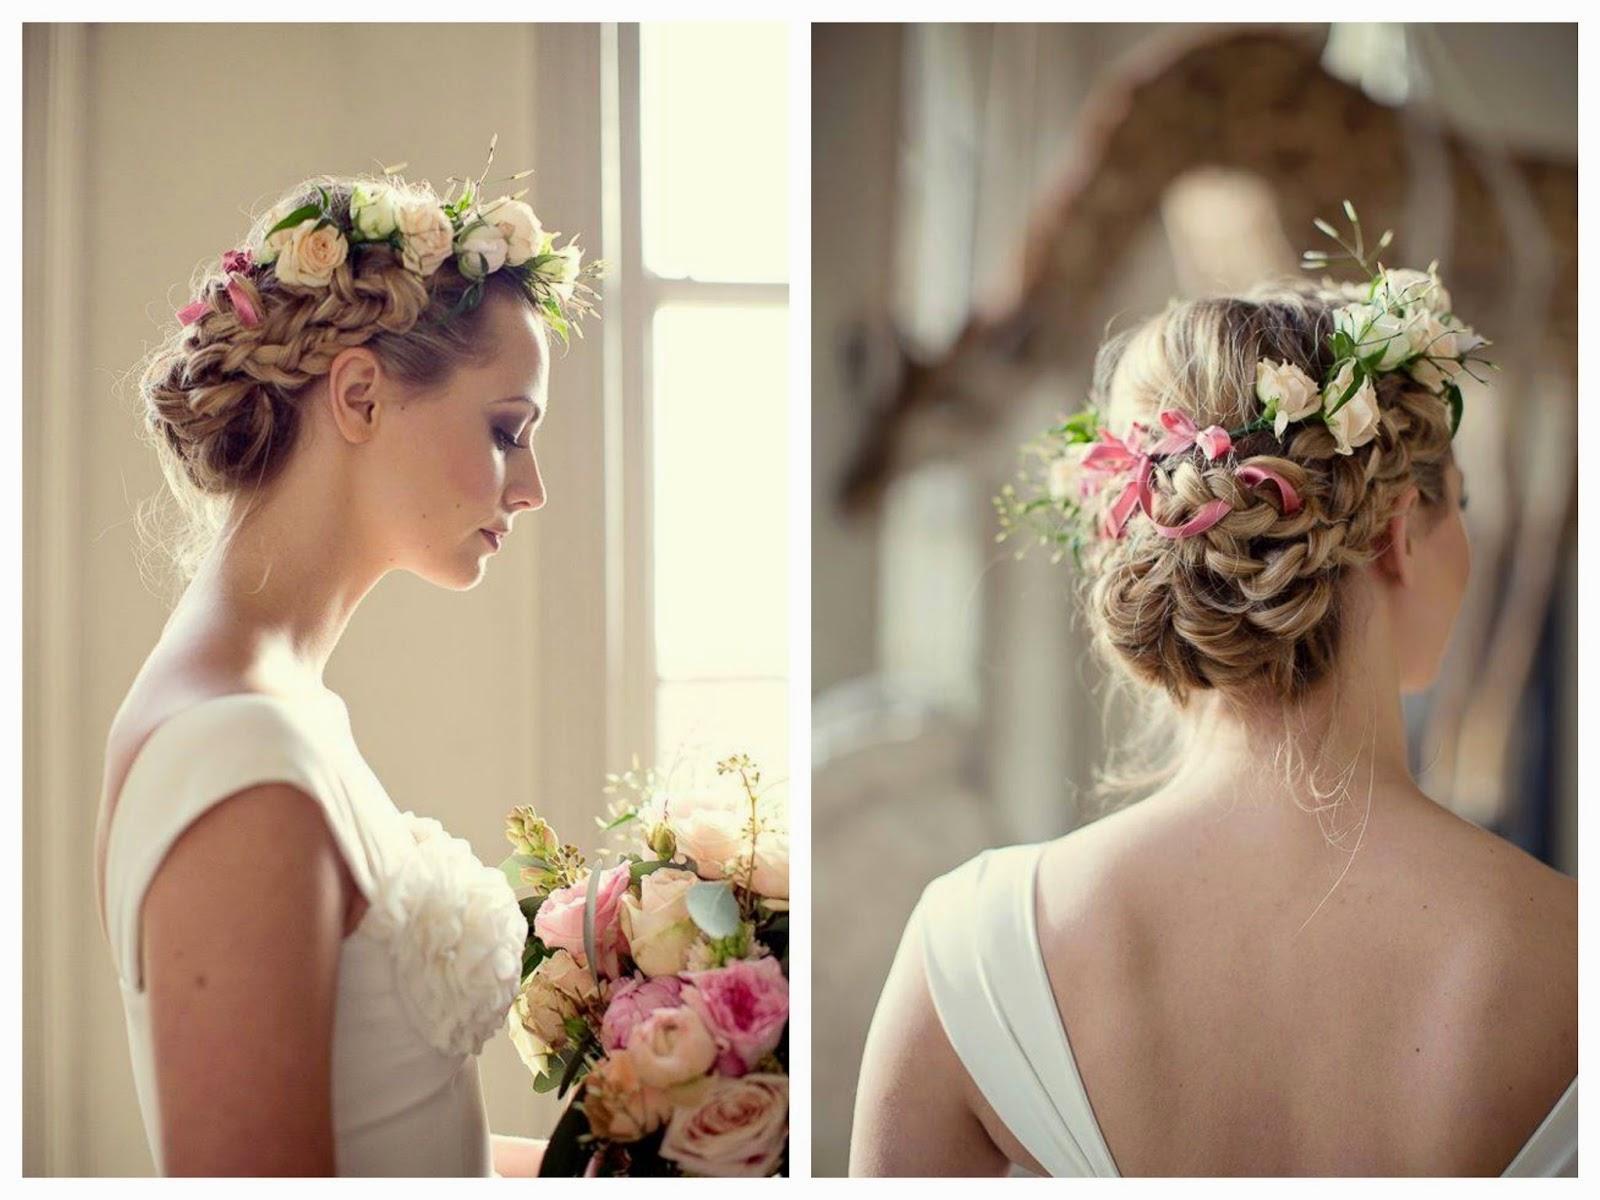 peinados naturales para novias las mejores ideas bodas